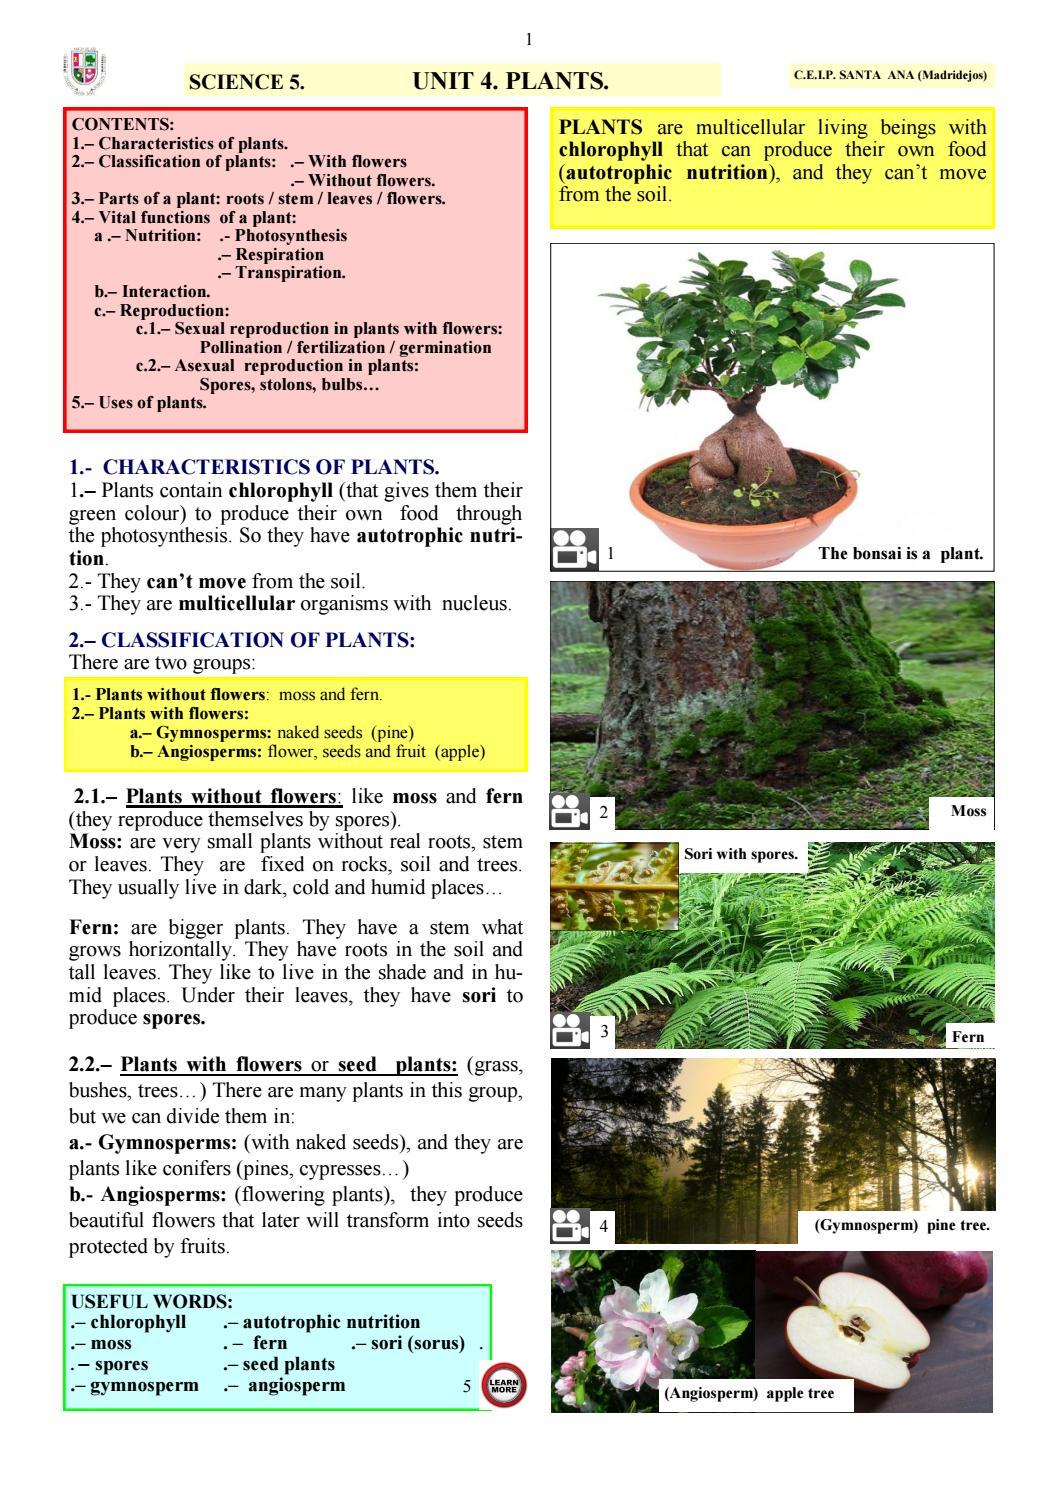 SCIENCE 5  UNIT 4  plants by ceipsantaana1 - issuu